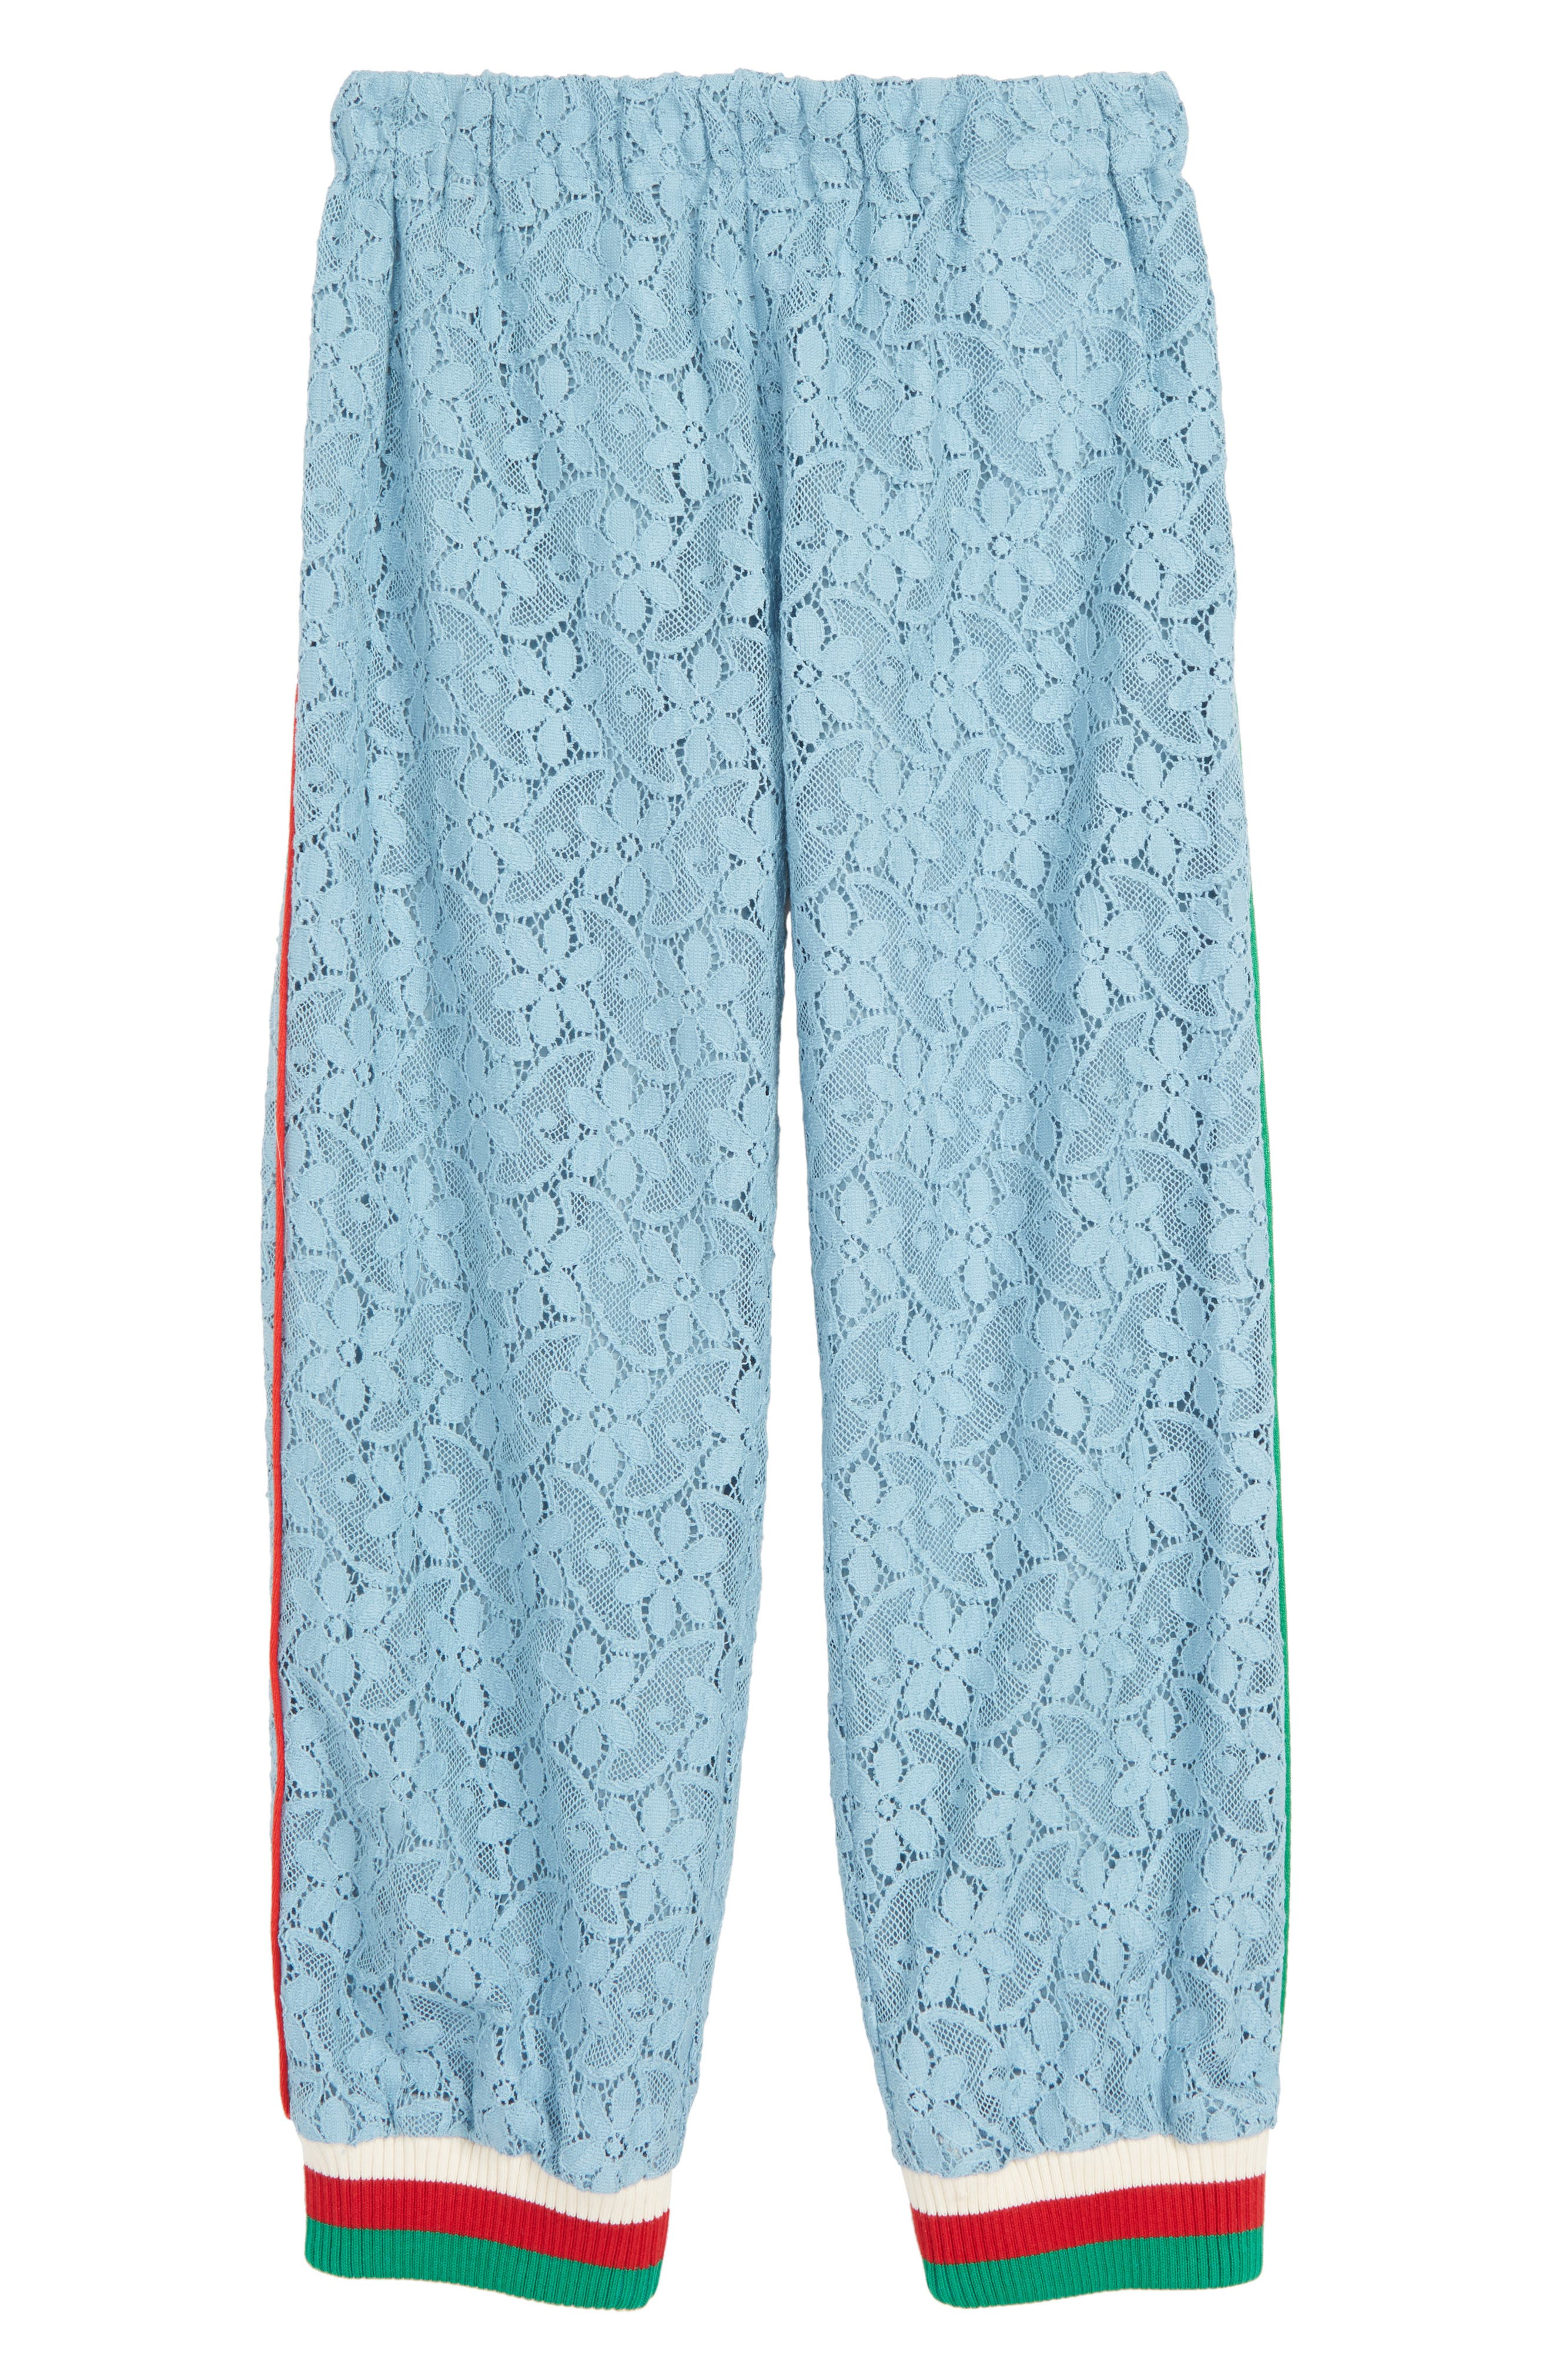 GUCCI Lace Jogger Pants, Main, color, SEA CLEAR BLUE